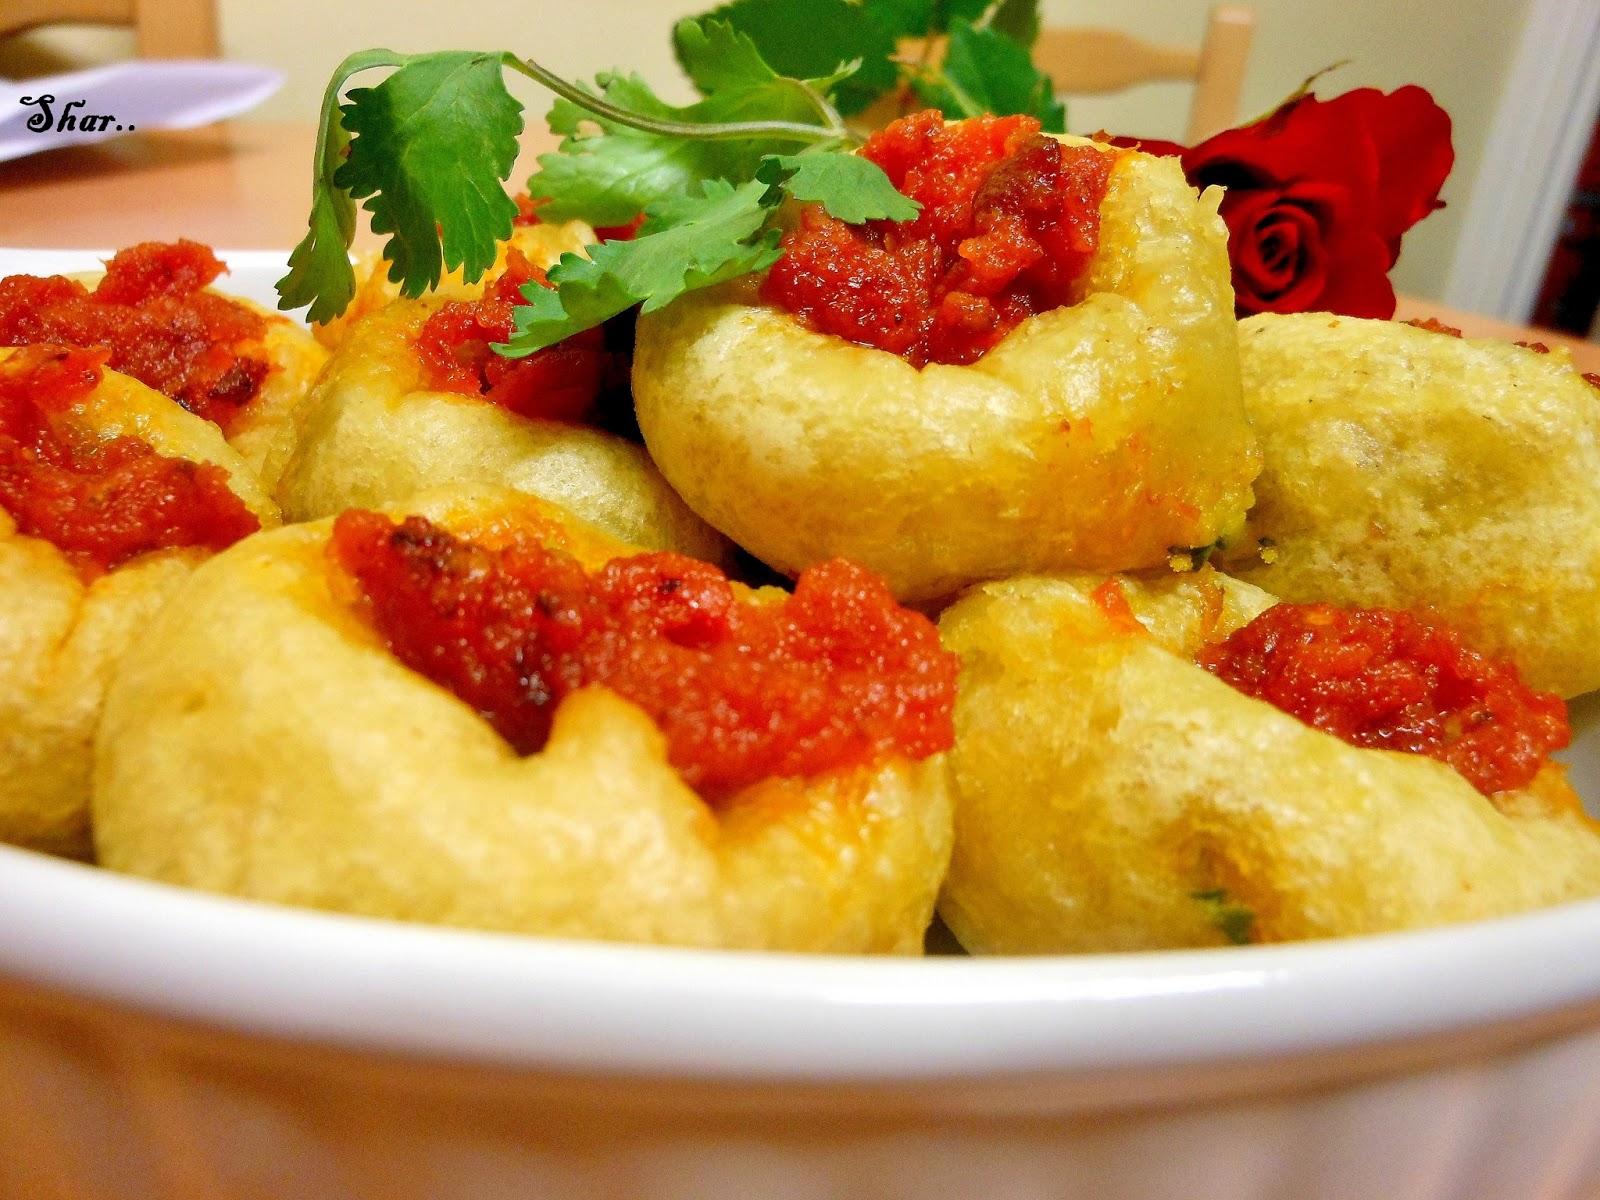 Amazing Mauritius Eid Al-Fitr Food - DSCN4895  Collection_431424 .JPG